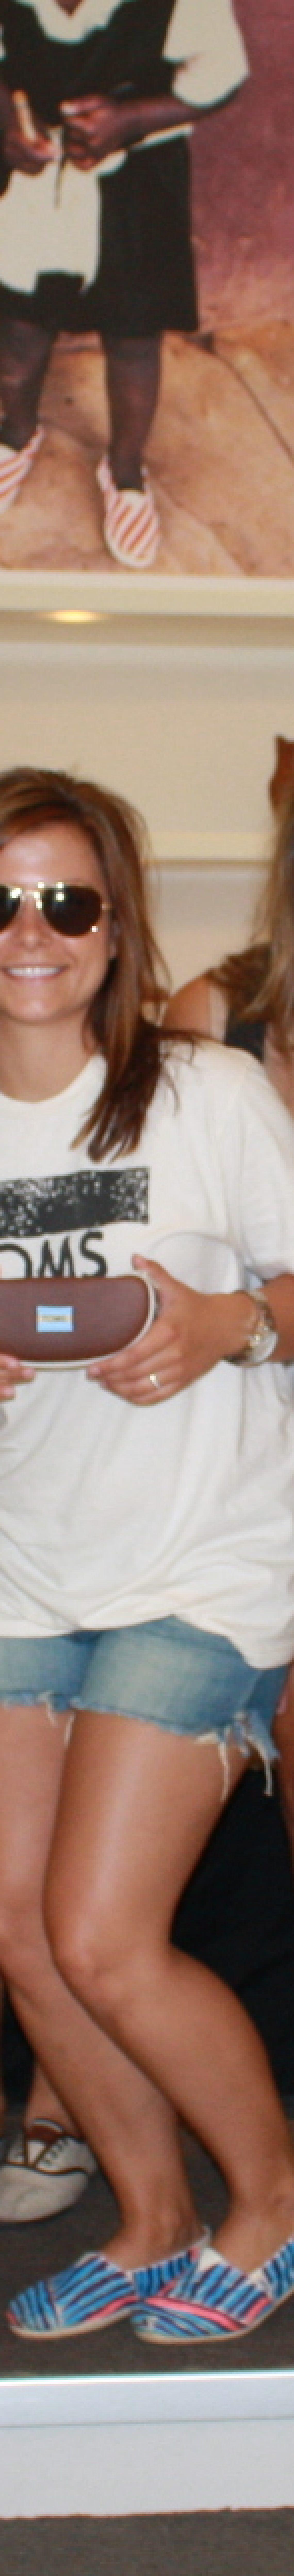 New TOMS Product at Masons